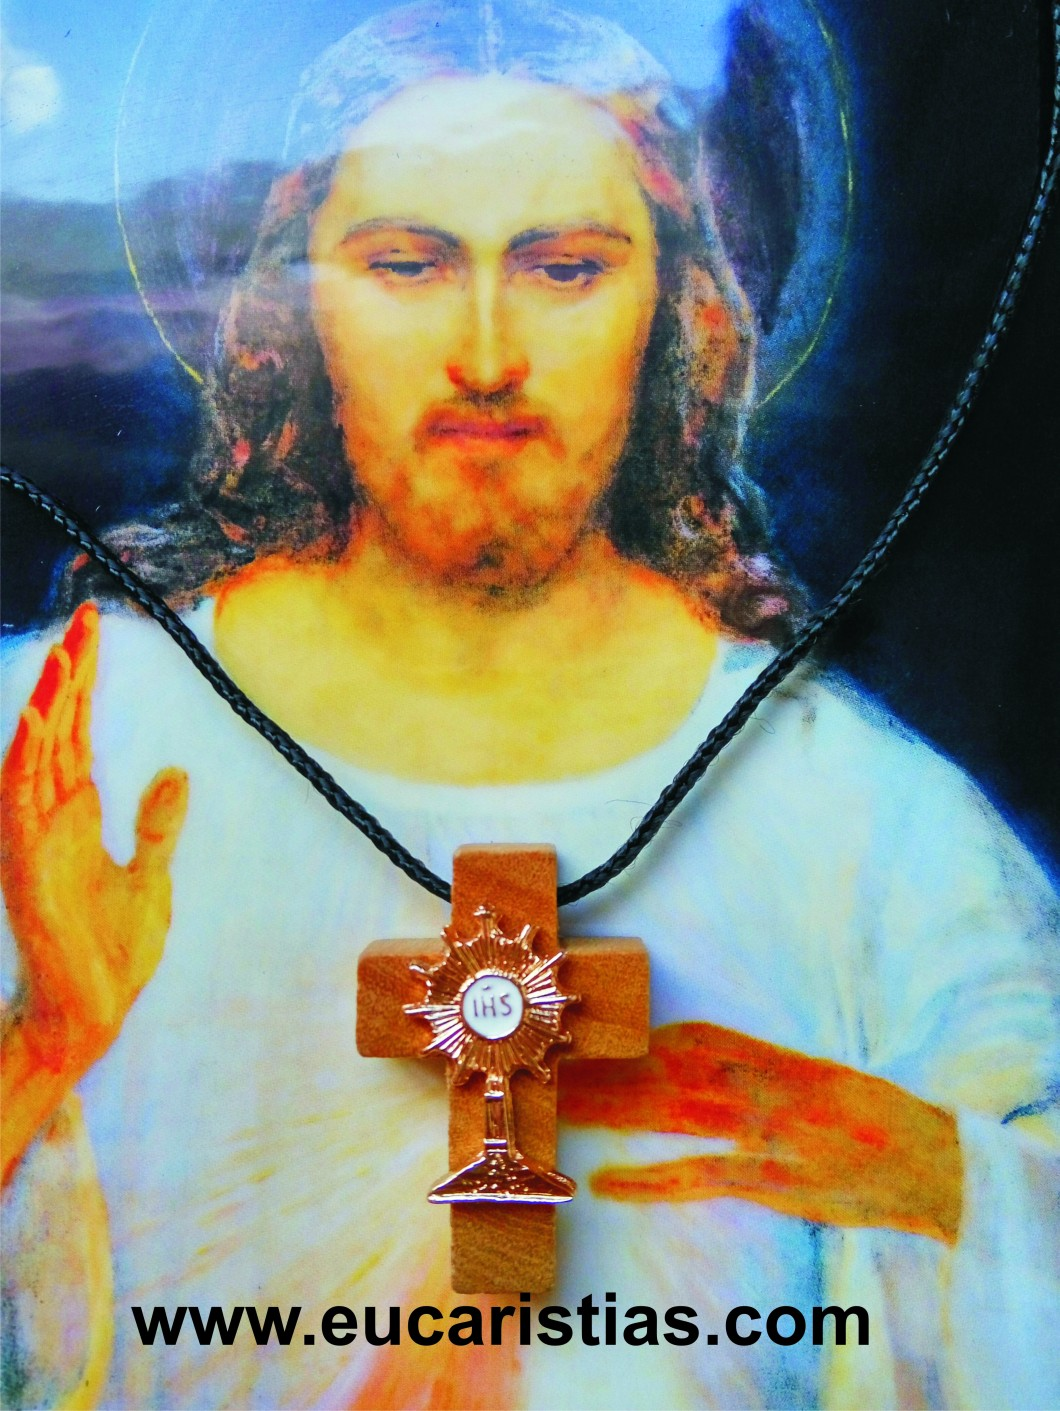 cruz eucaristica de la Misa del Papa francisco.